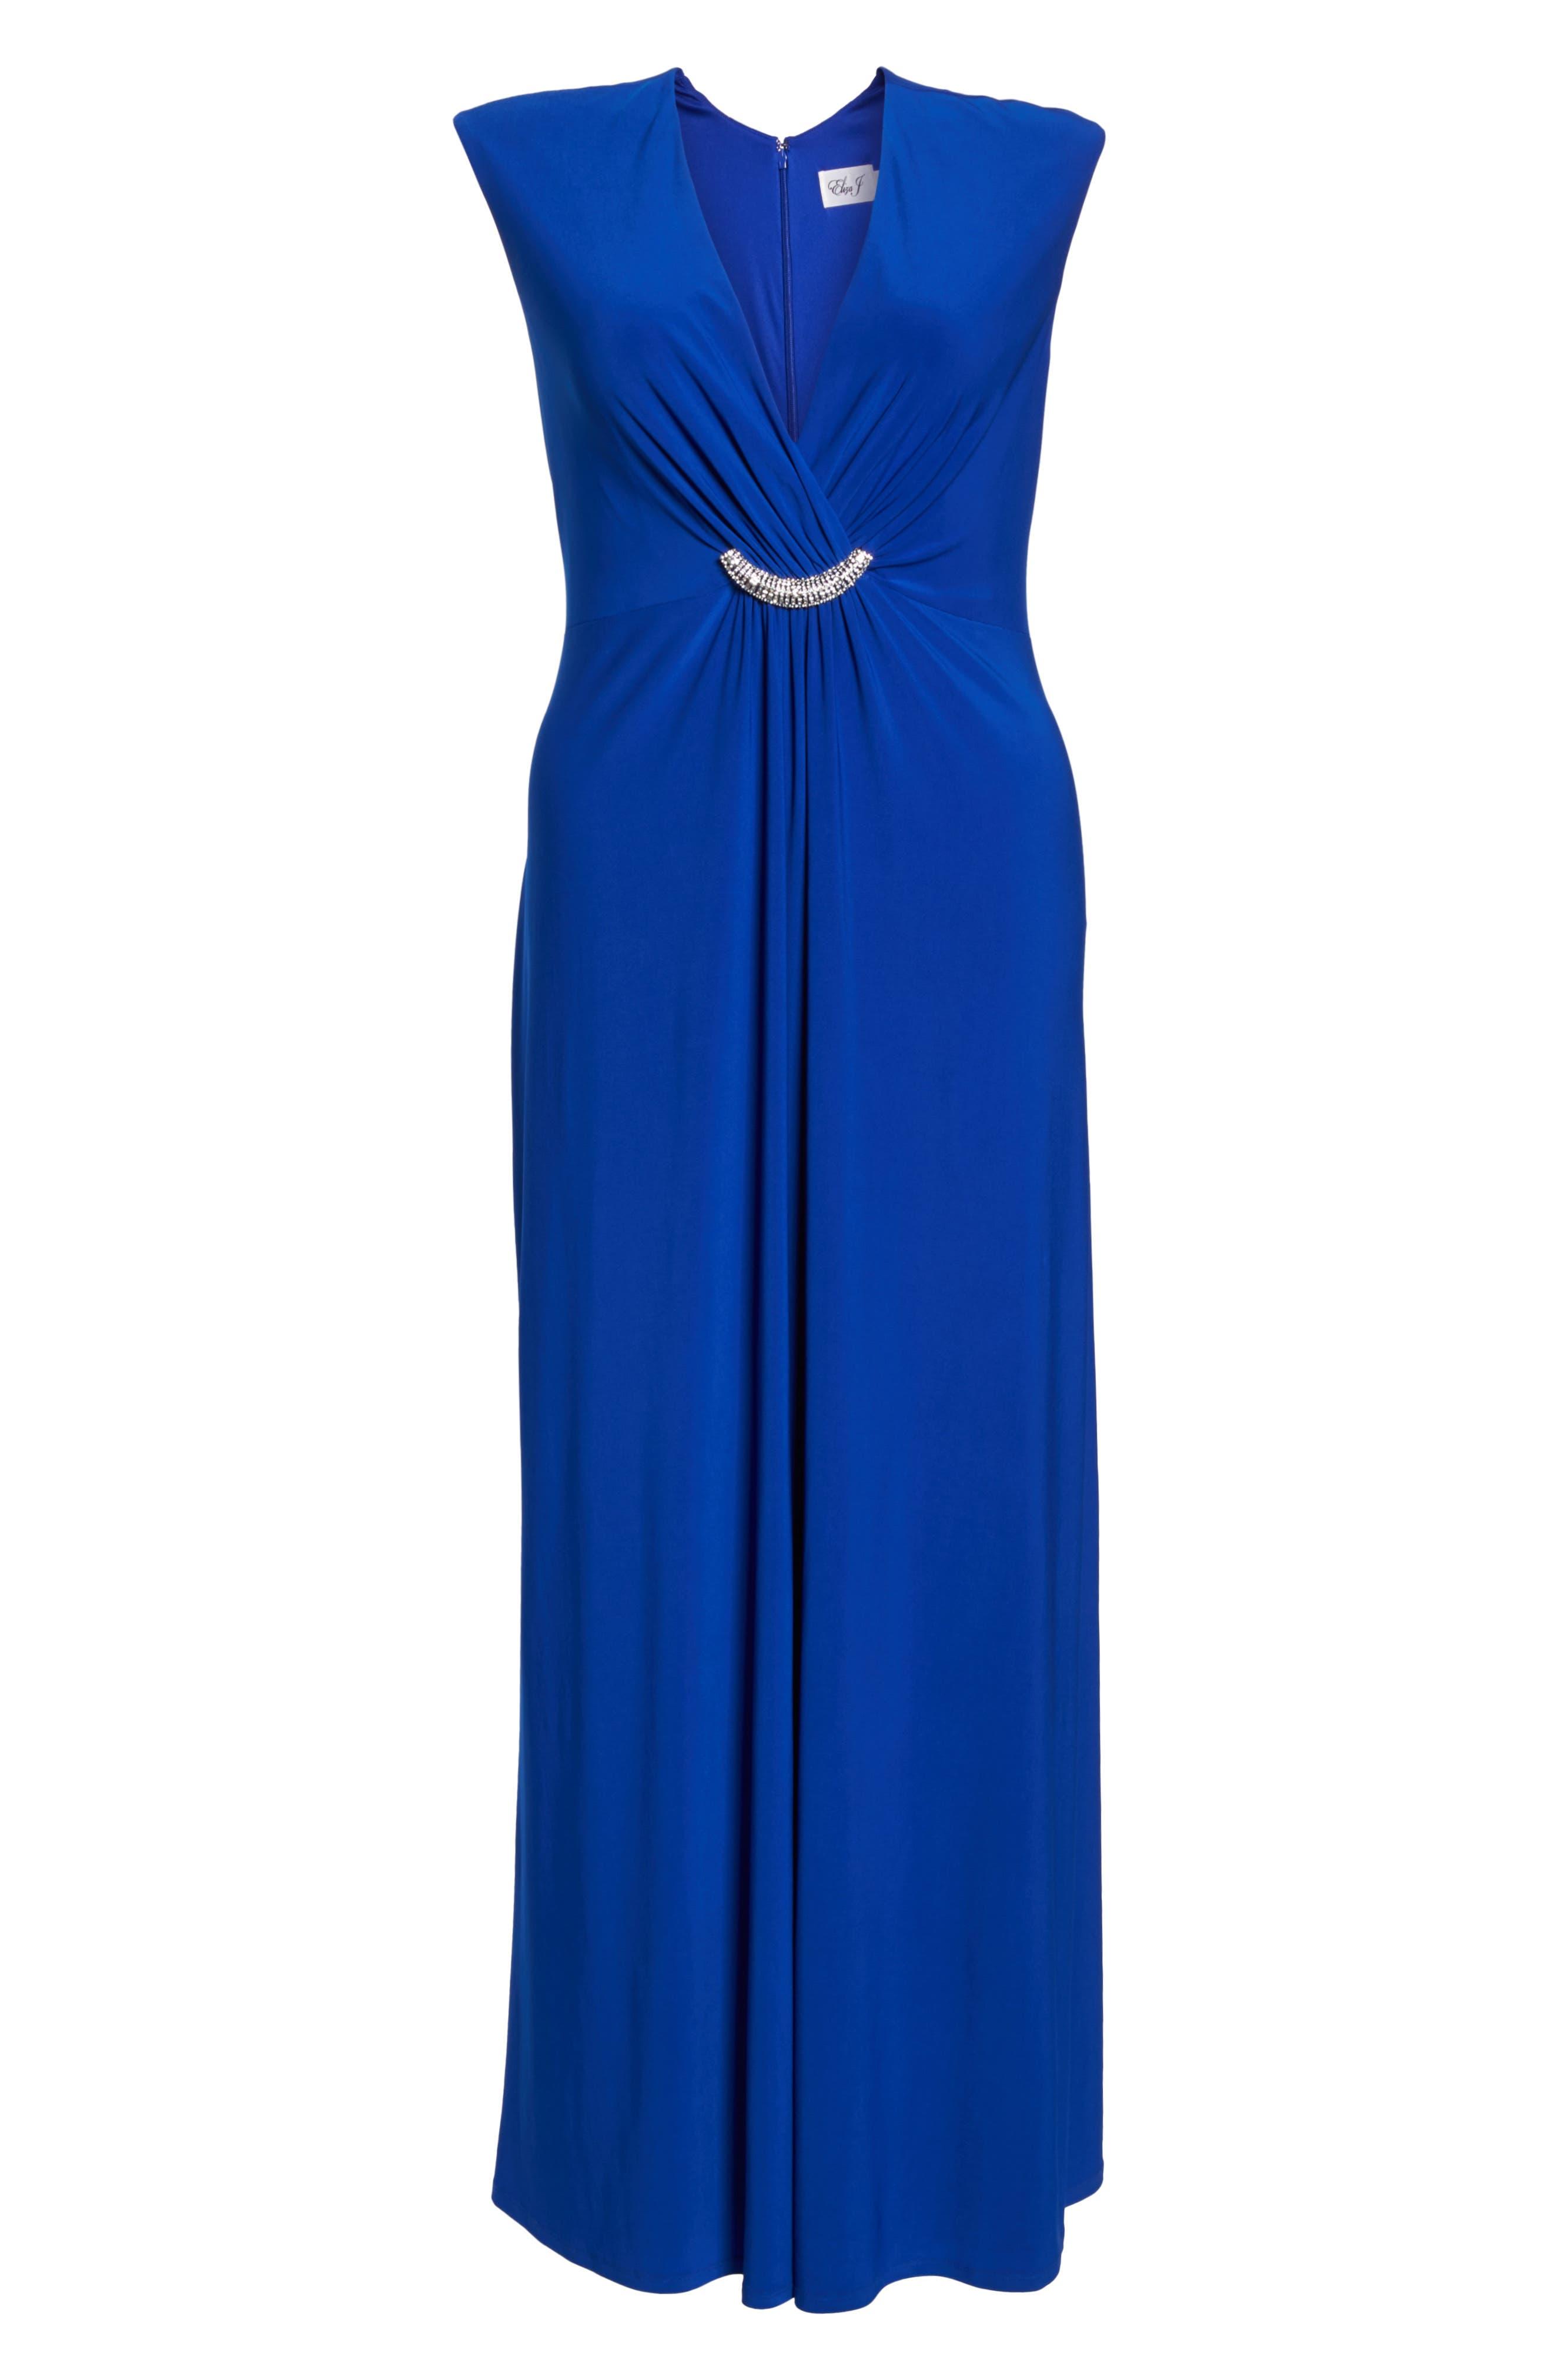 Embellished Surplice Dress,                             Alternate thumbnail 7, color,                             430